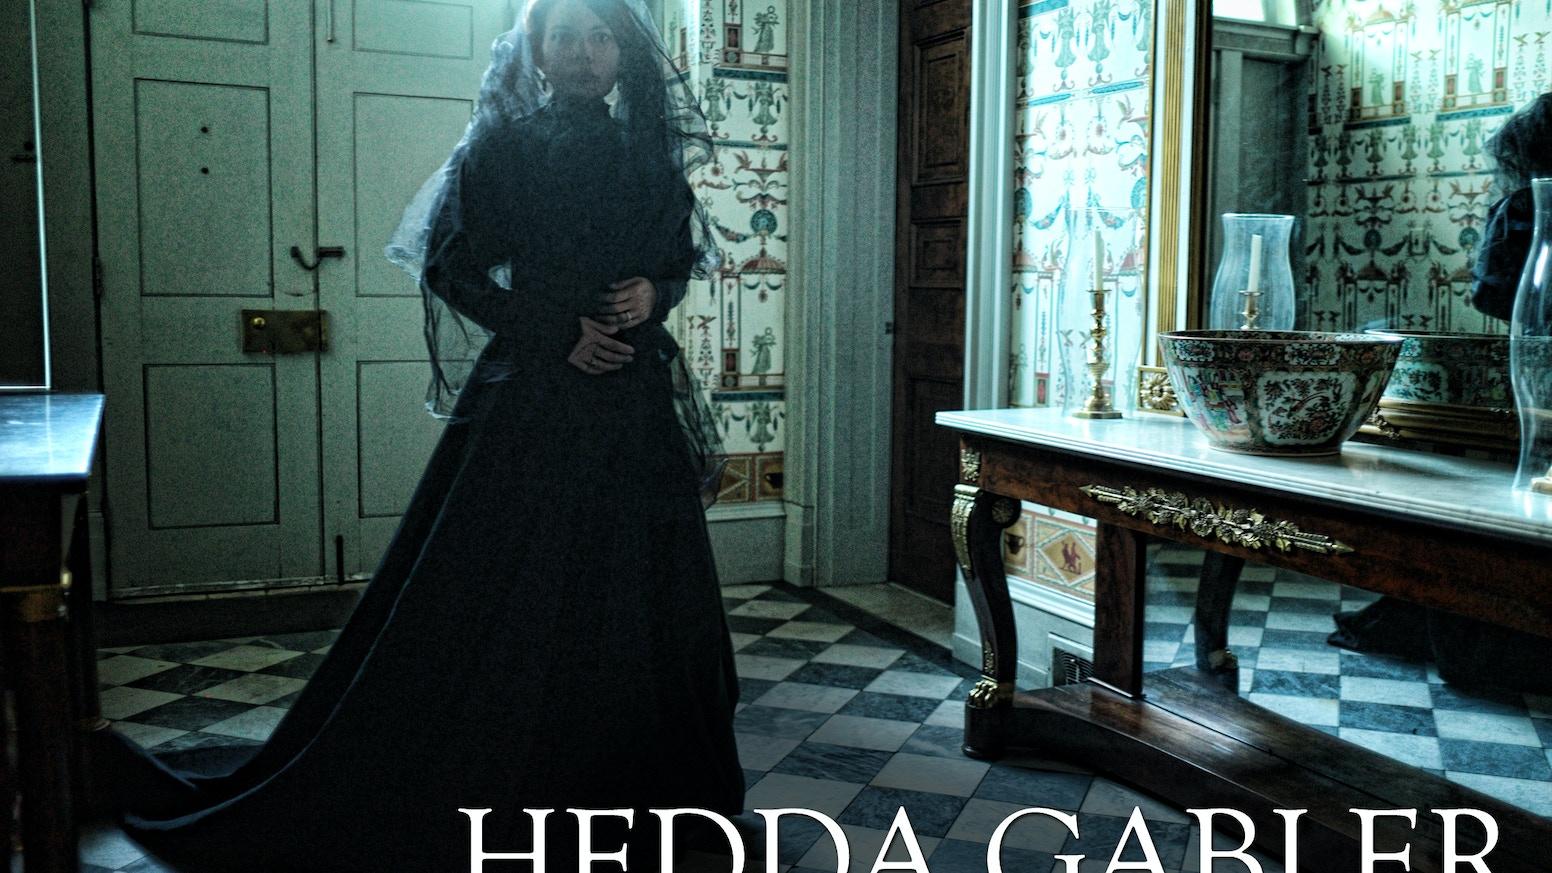 Hedda Gabler A Play And Film By Kyle Cassidy Kickstarter